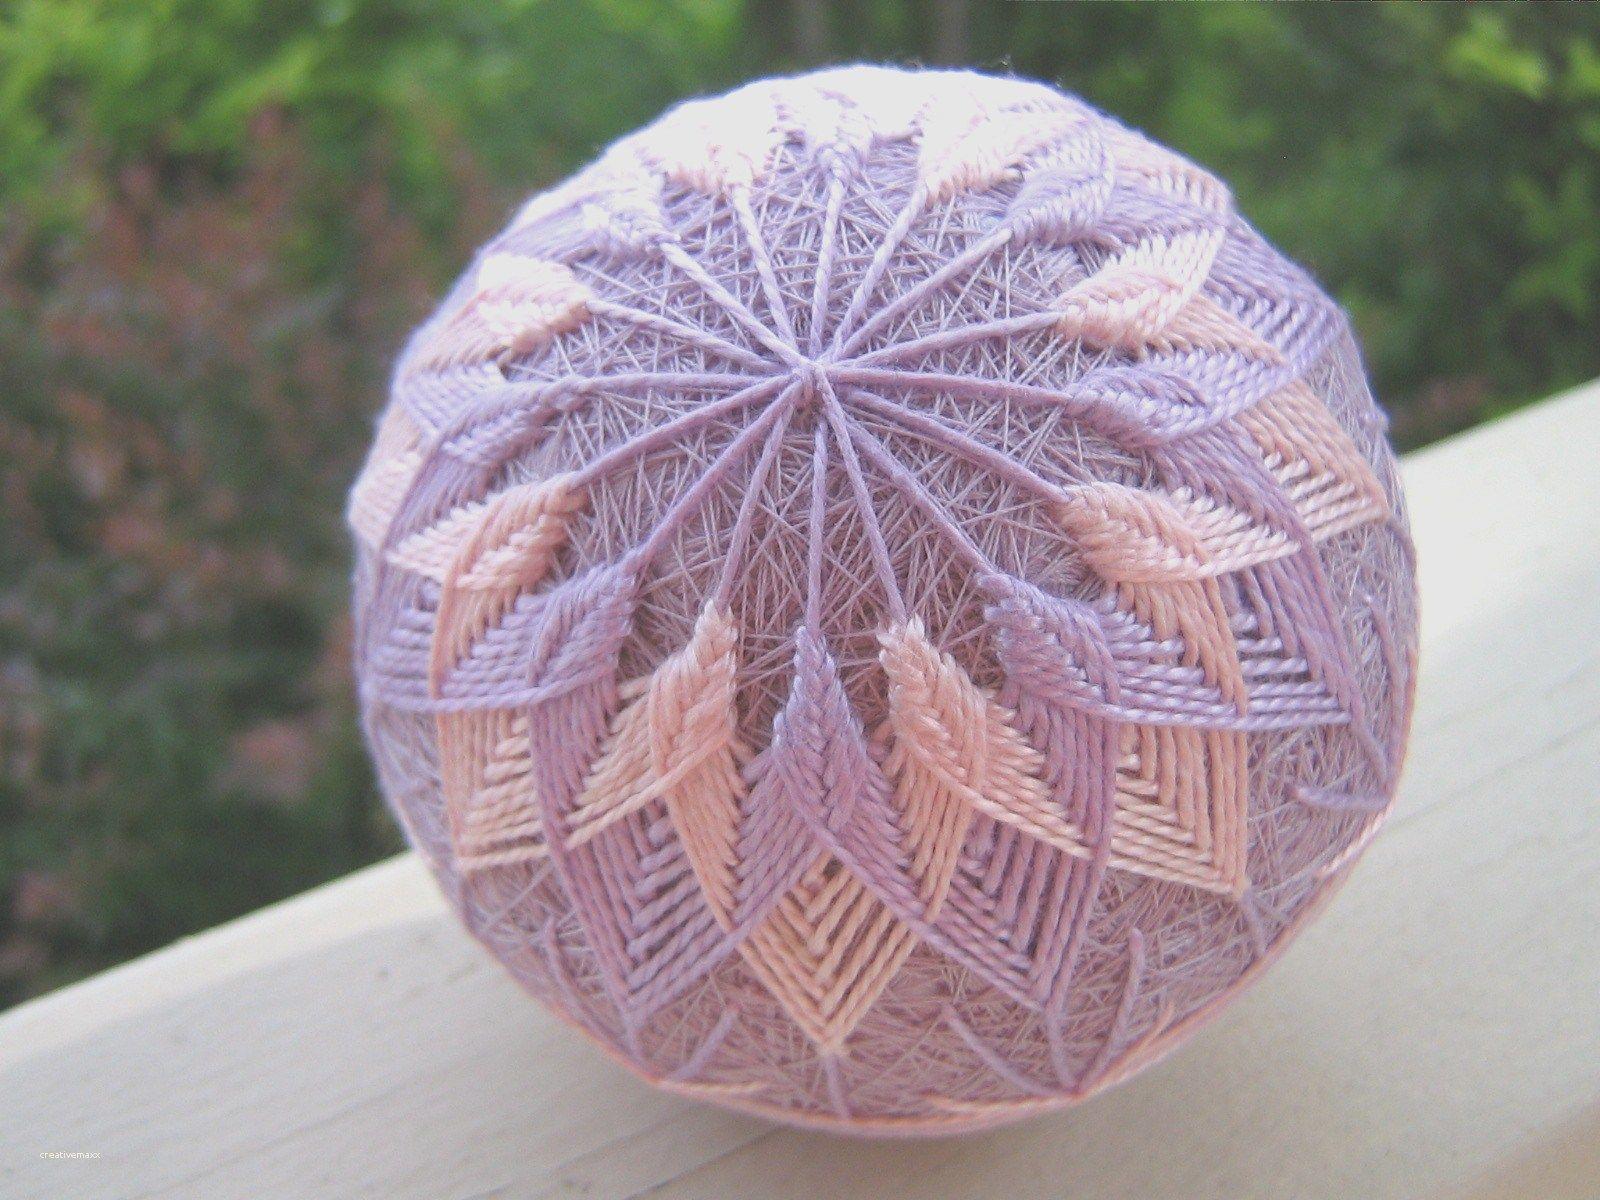 Purple Decorative Balls 16 Elegant Decorative Ball Designs That Will Inspire You  Jute